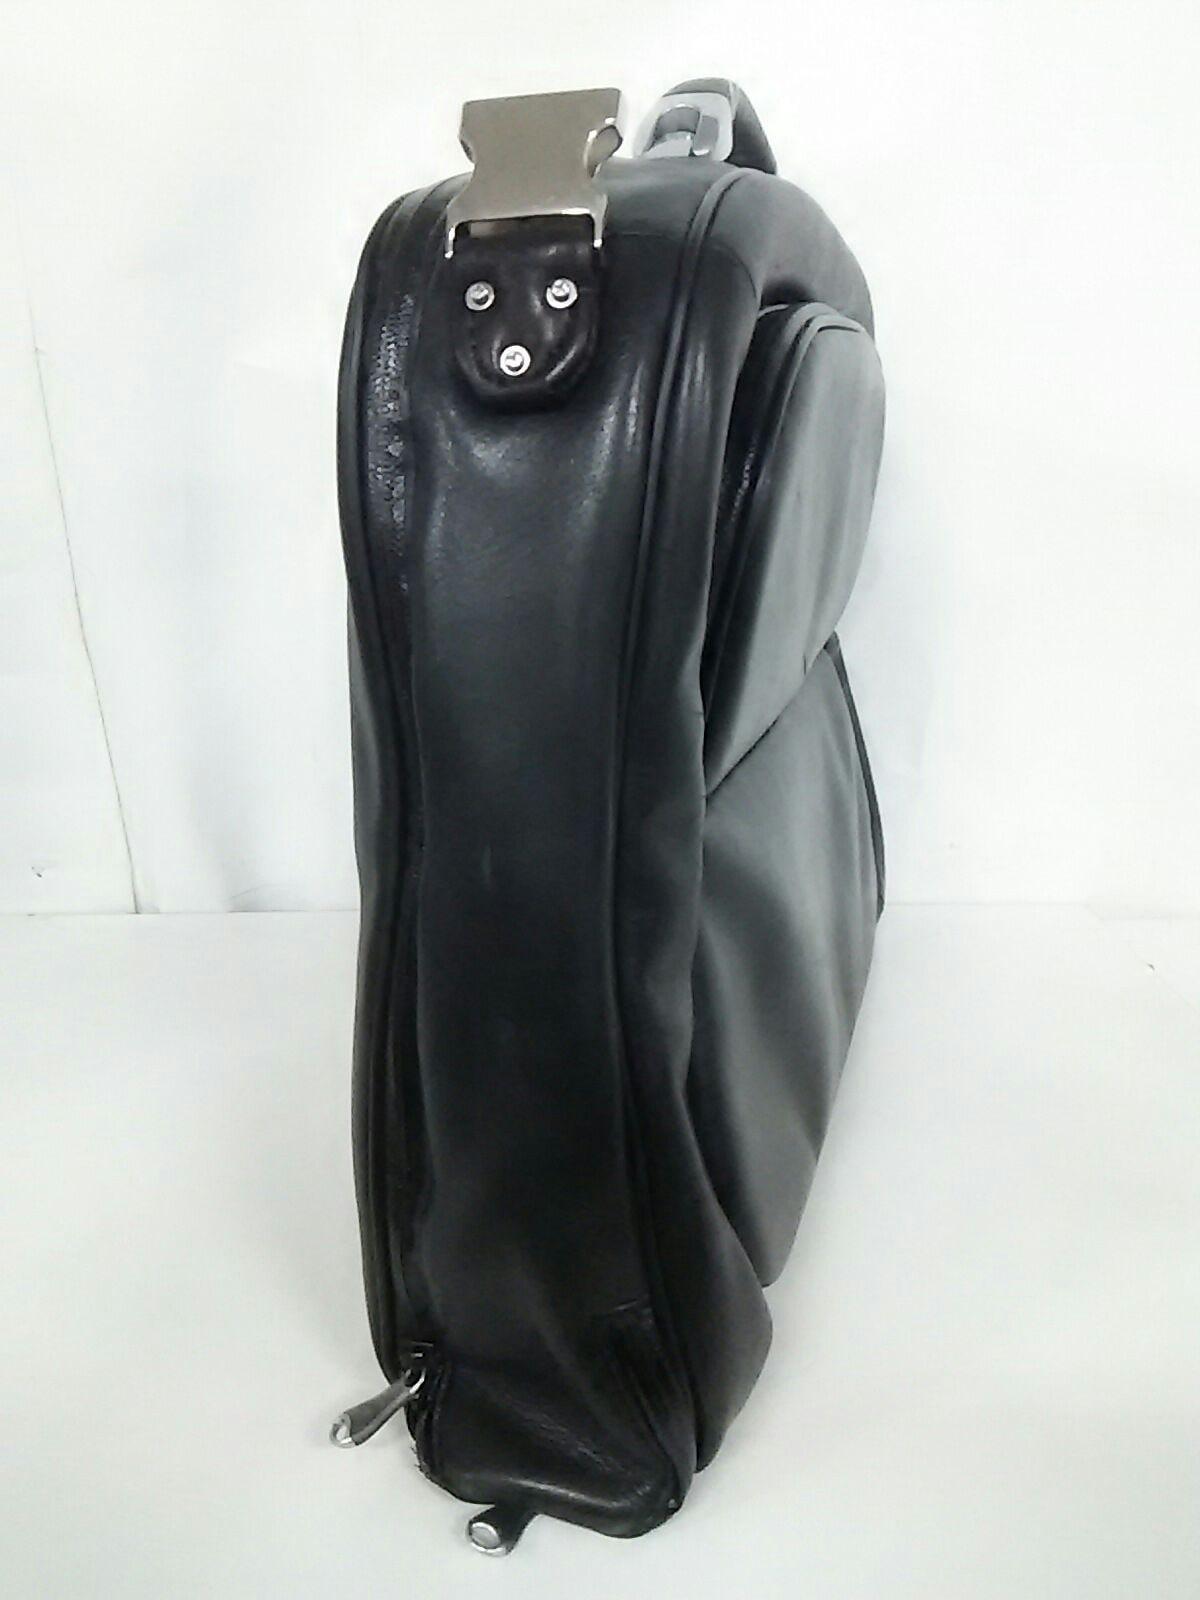 ISABURO 1889(イサブロイチハチハチキュー)のその他バッグ